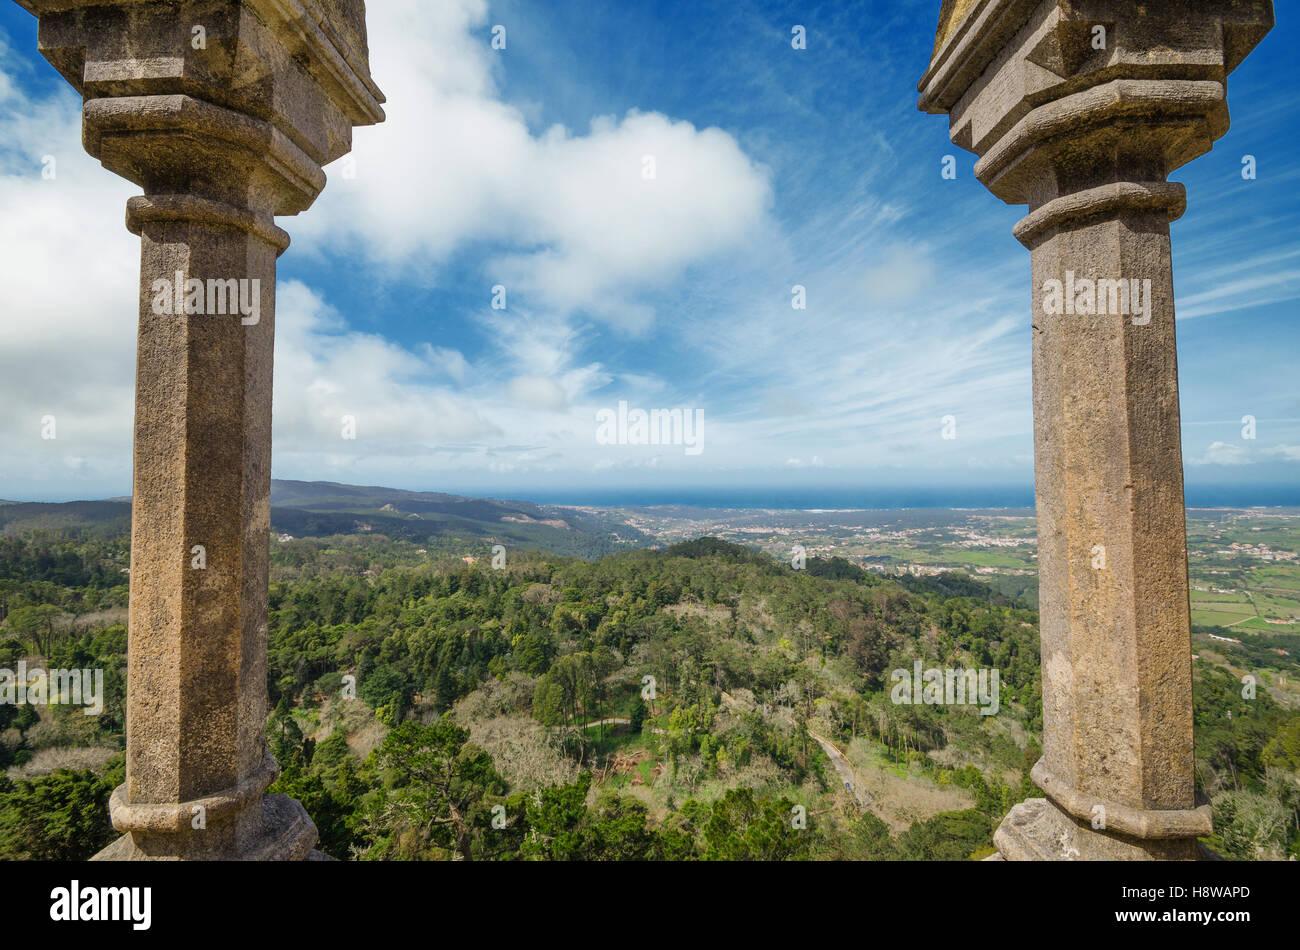 Viewpoint in Castle da Pena in Sintra, Portugal. - Stock Image